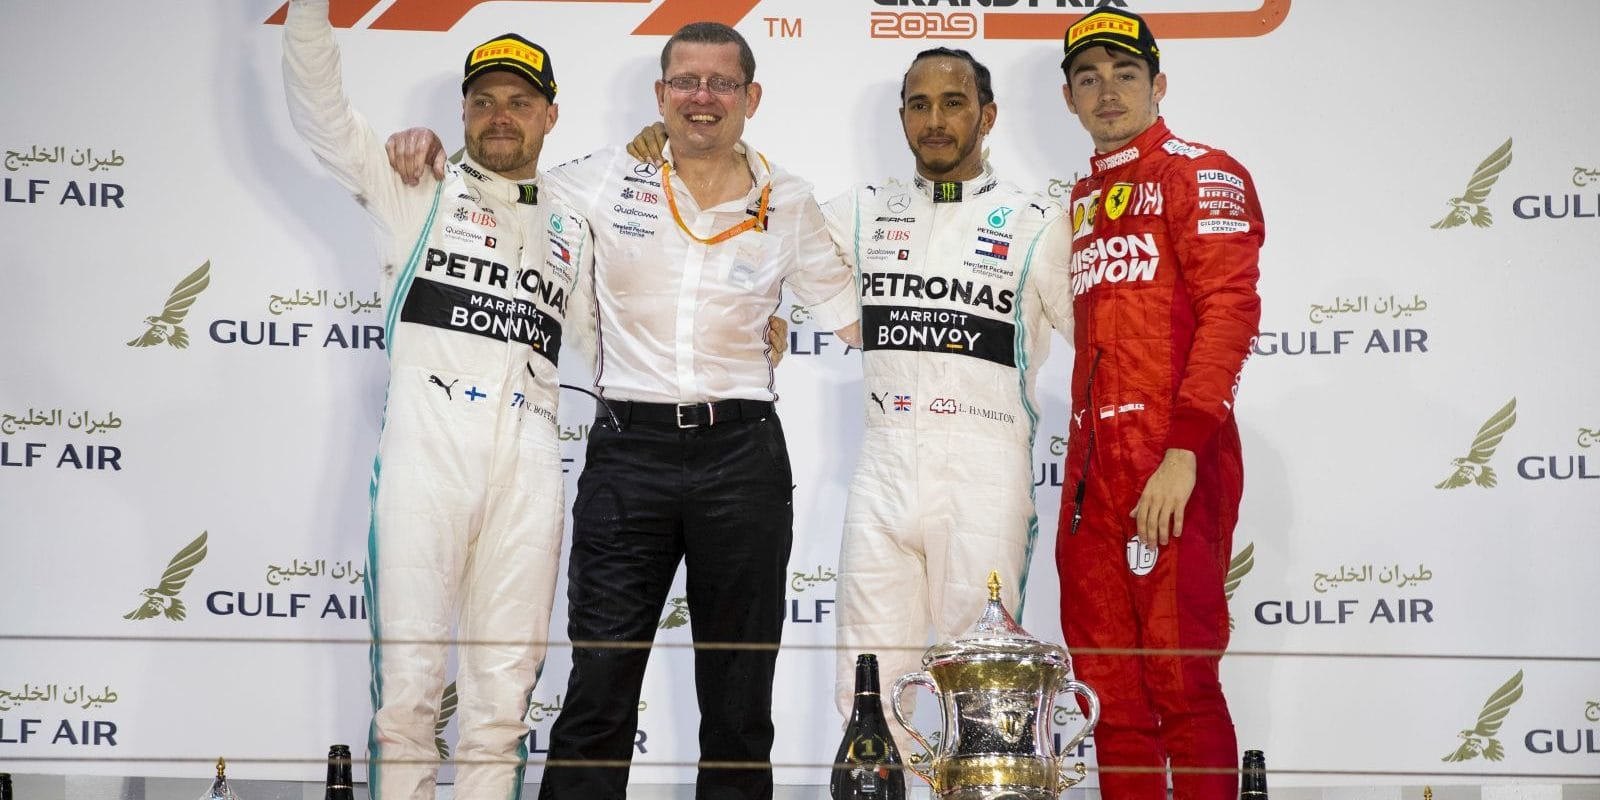 Velká cena Bahrajnu 2019